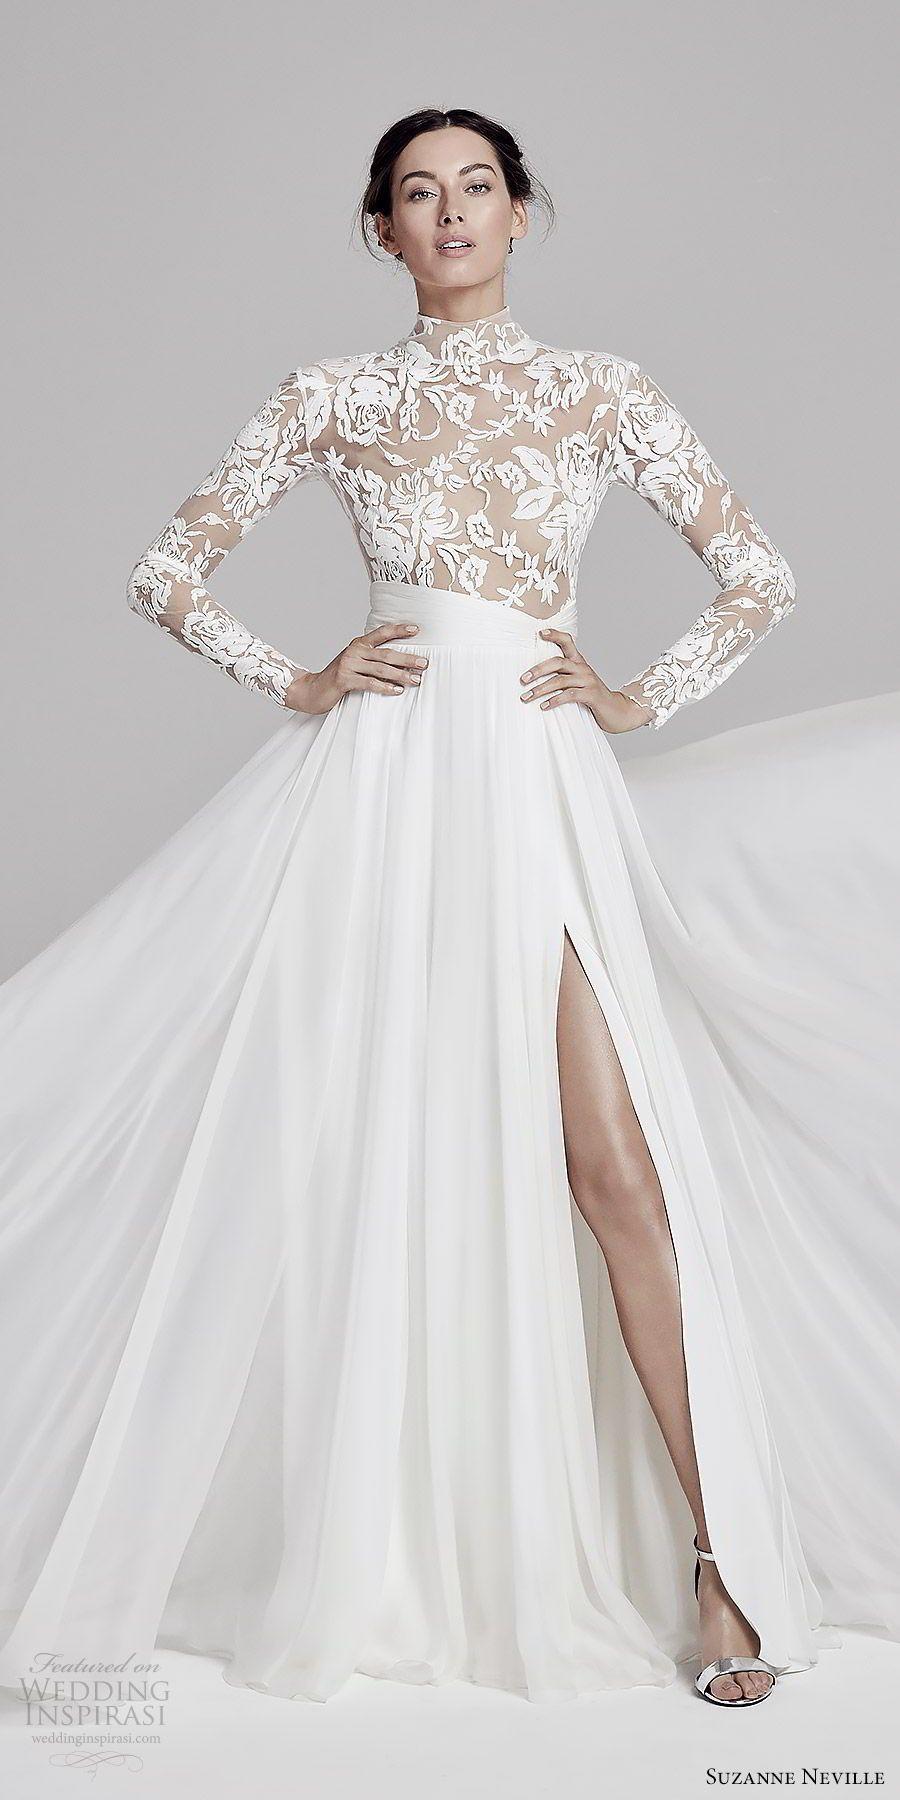 Suzanne Neville 2019 Wedding Dresses in 2020 Celebrity